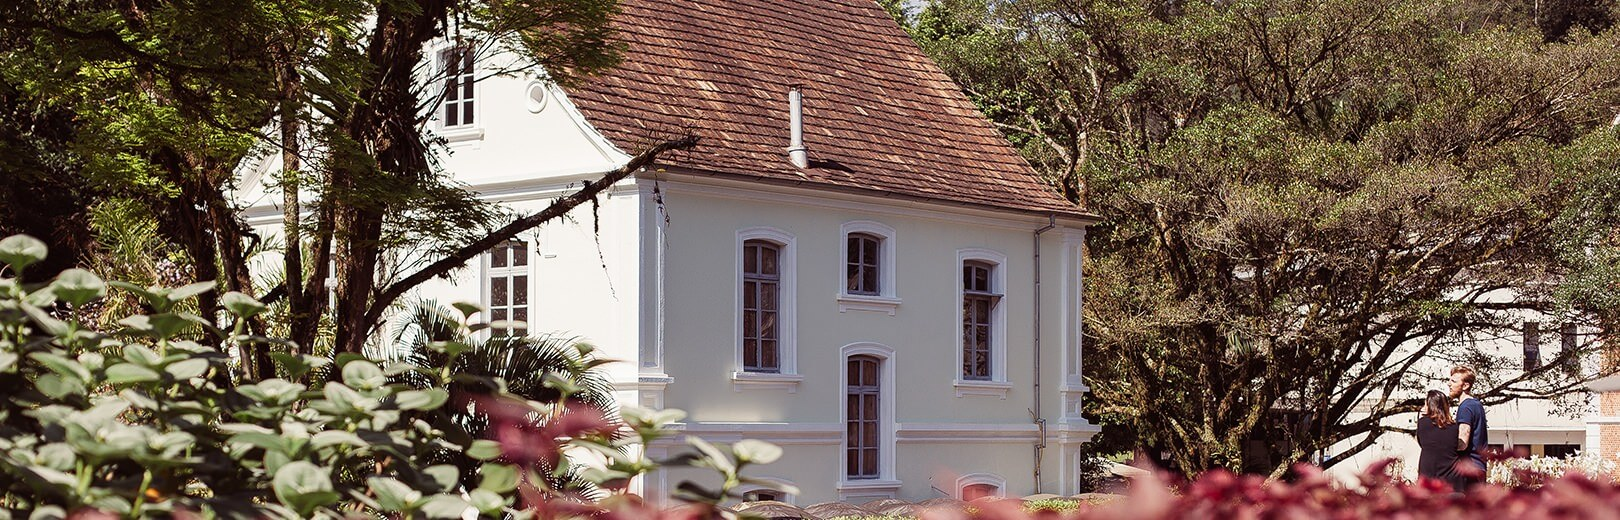 Museu Hering em Blumenau: Área externa